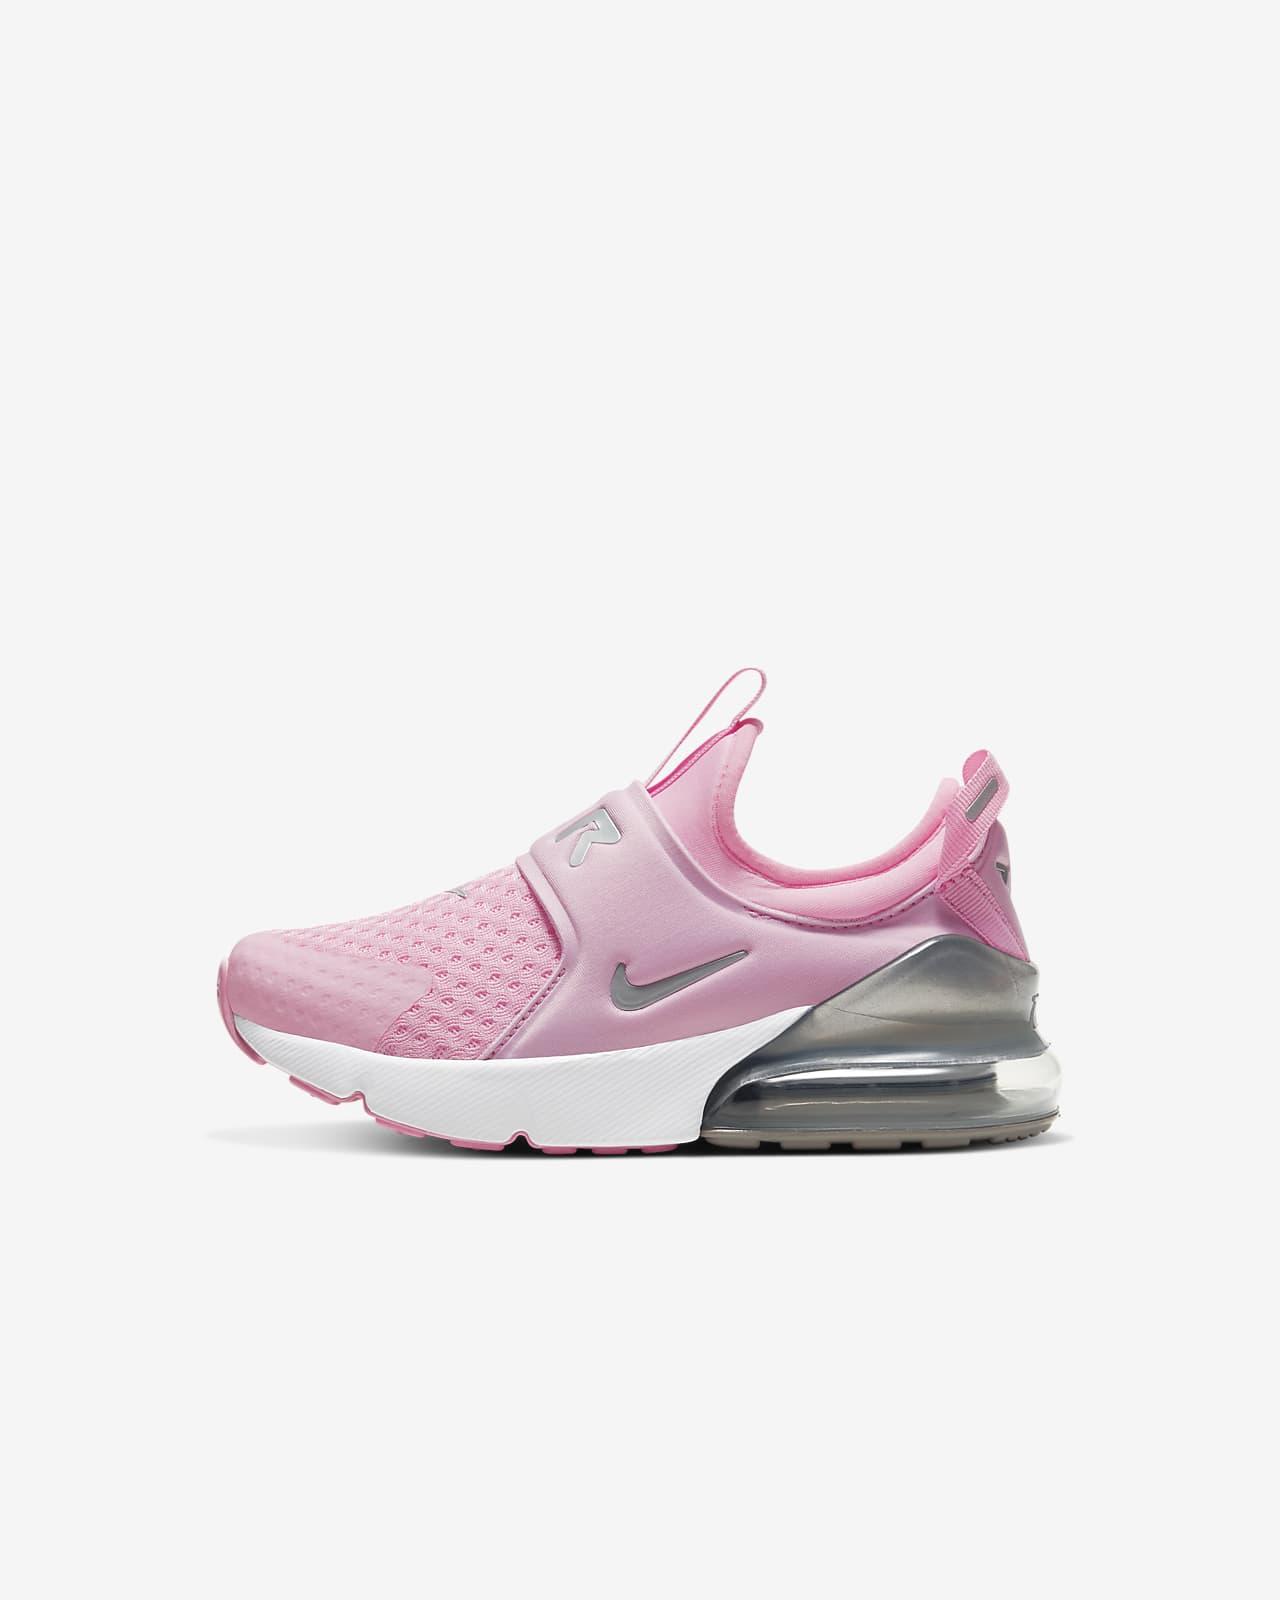 Nike Air Max 2090 Homme Chaussures @ Foot Locker